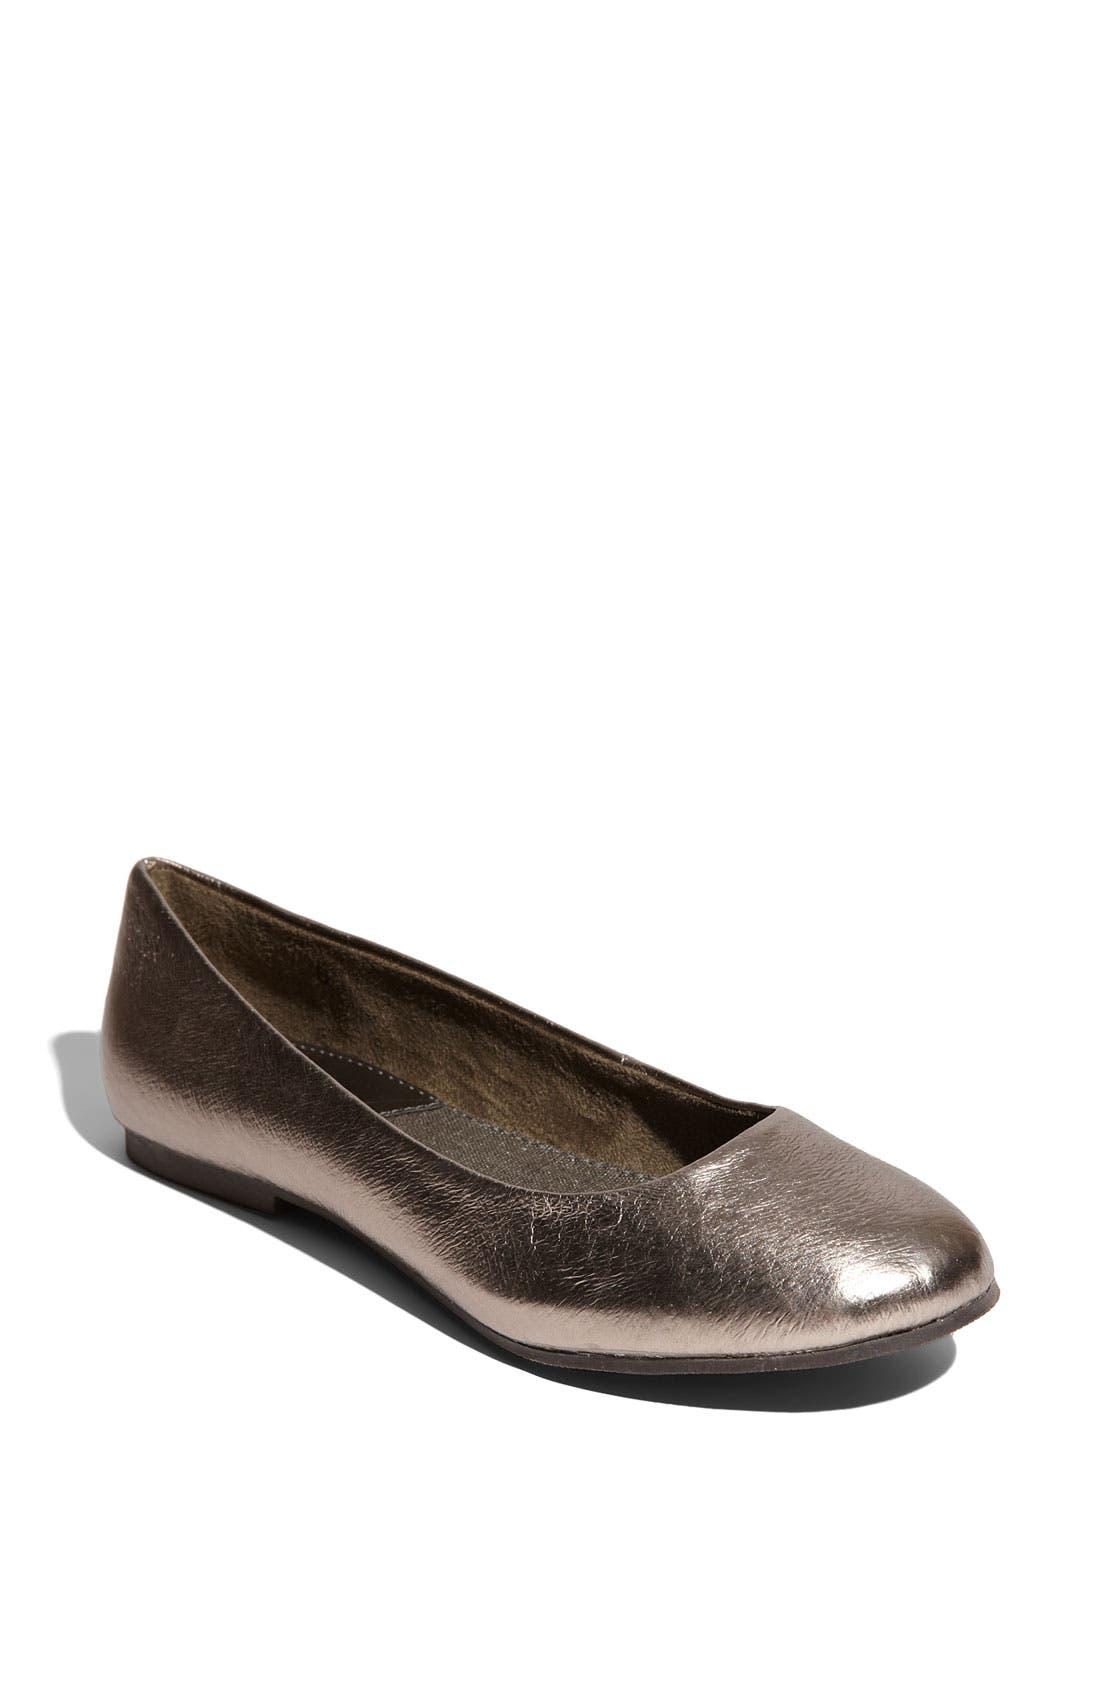 Main Image - BC Footwear 'Limousine' Flat